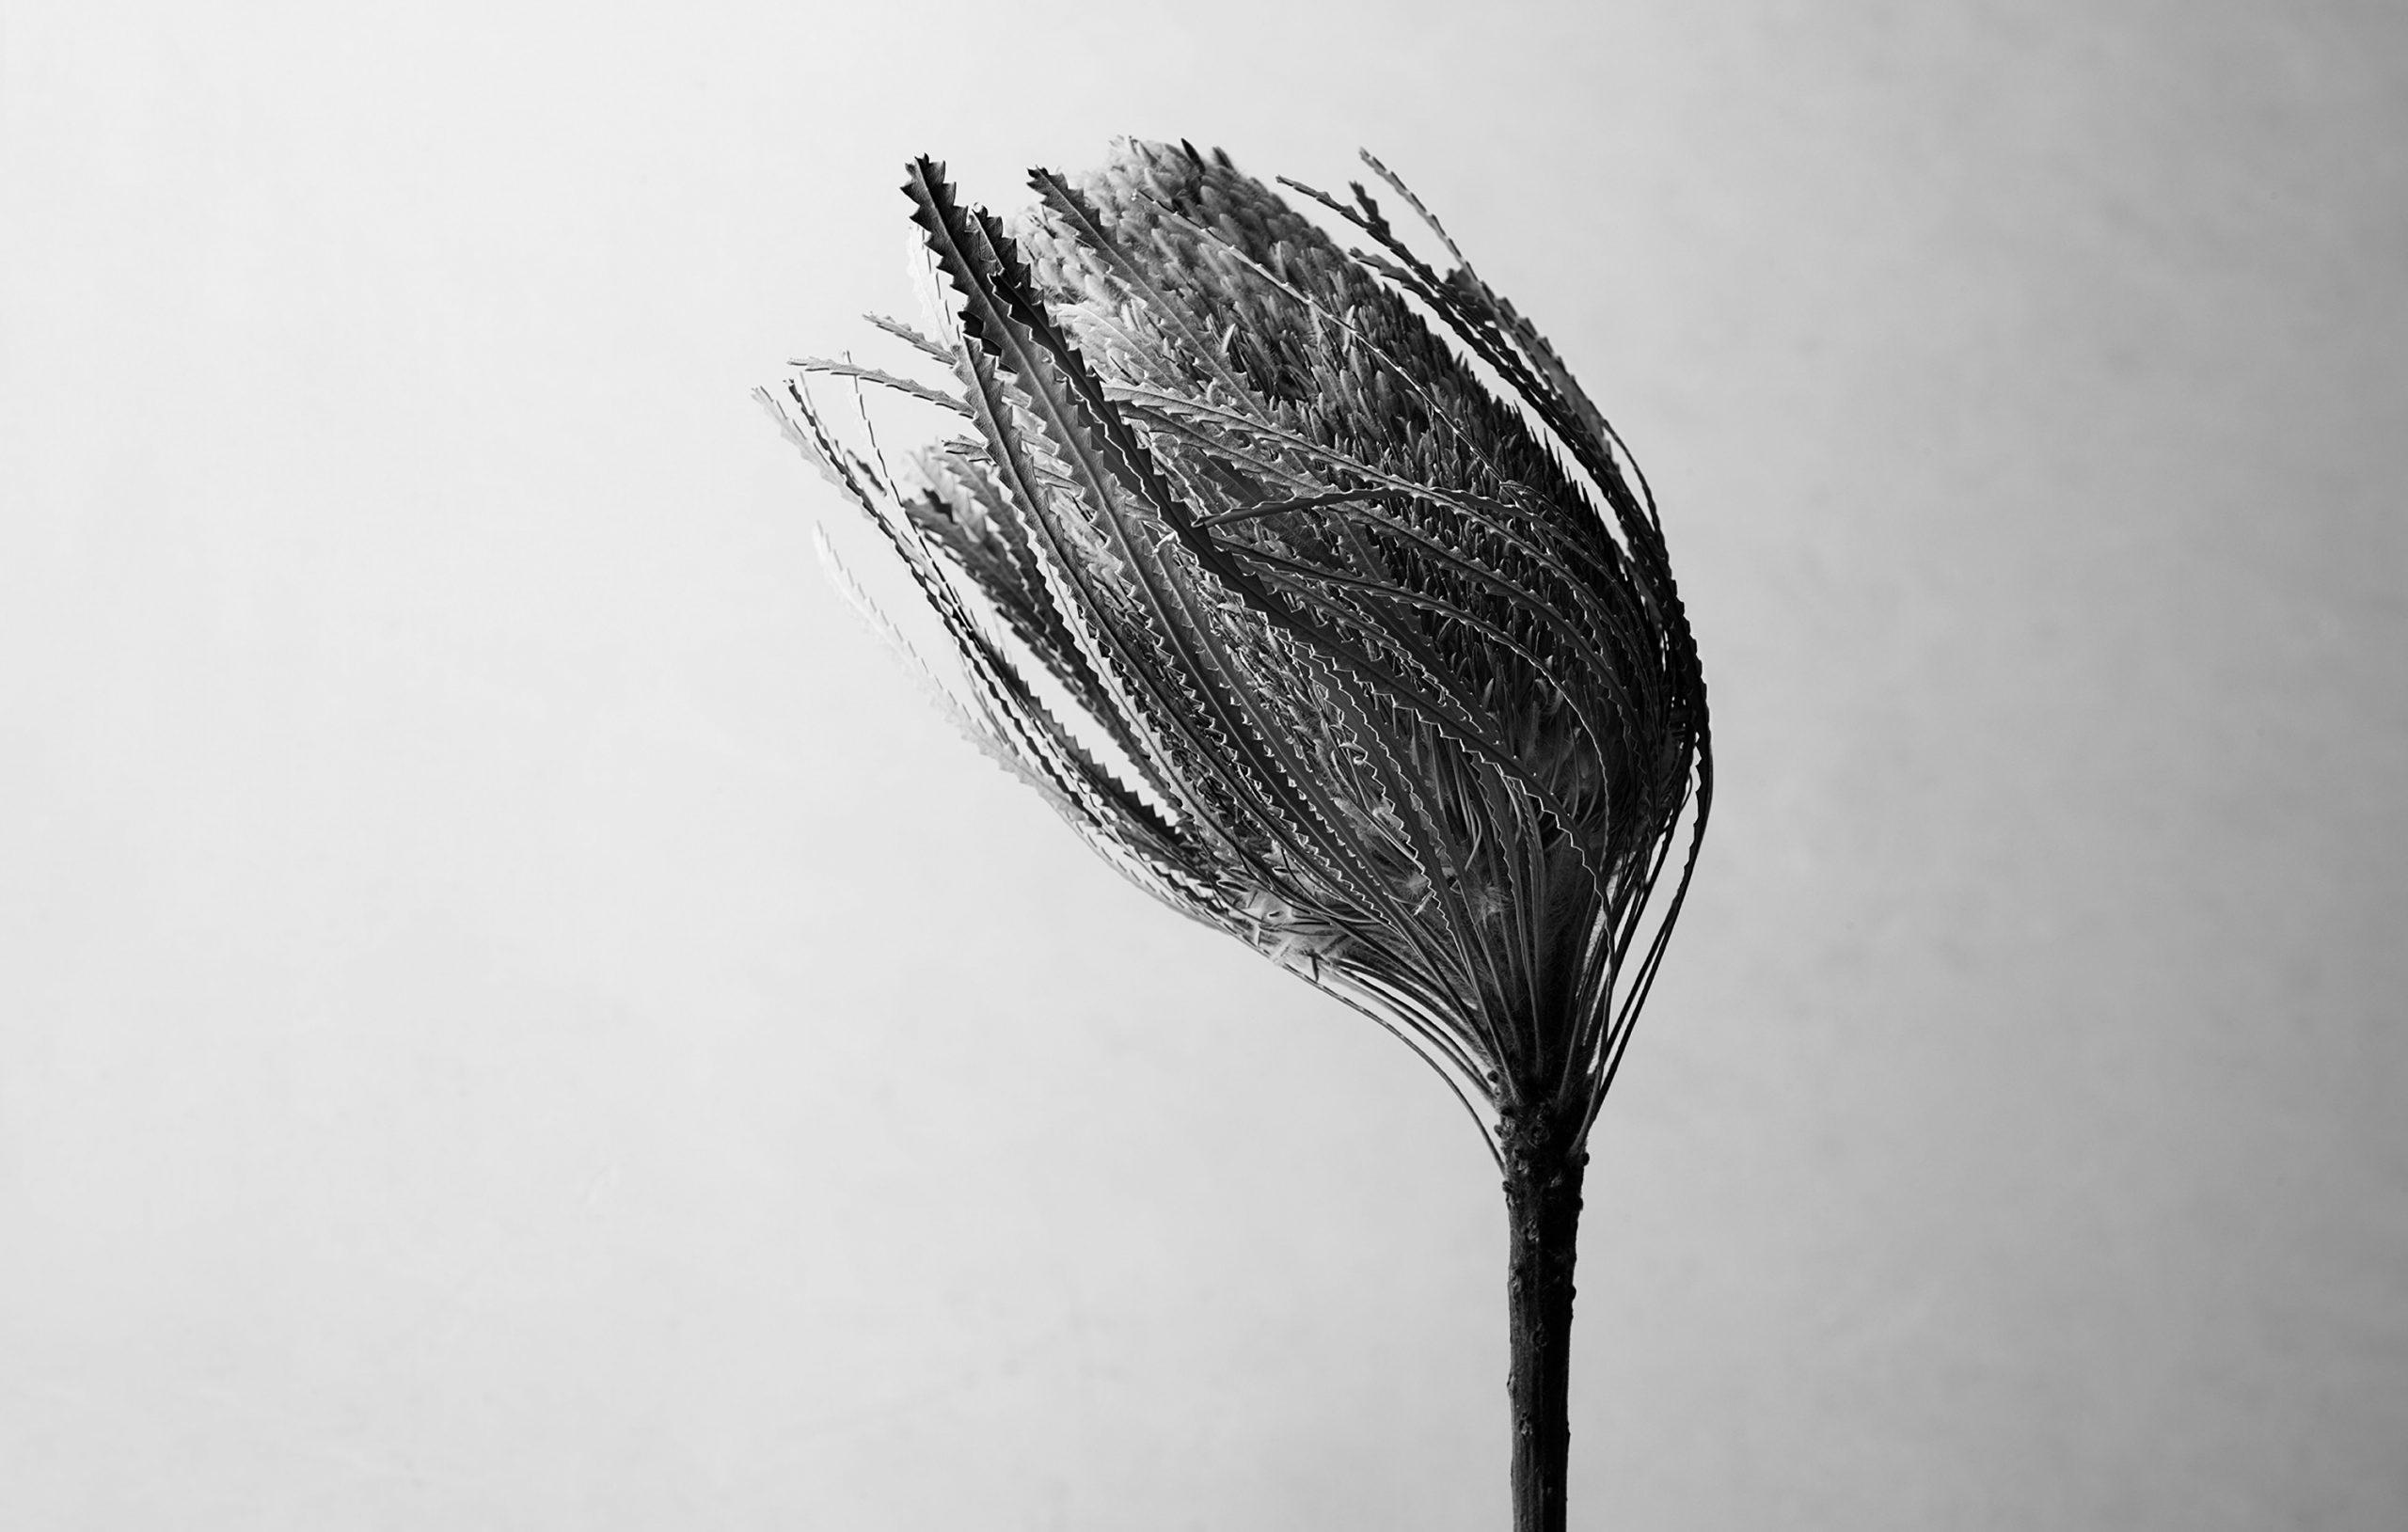 rf4159_ILA_Spa_S09_wind